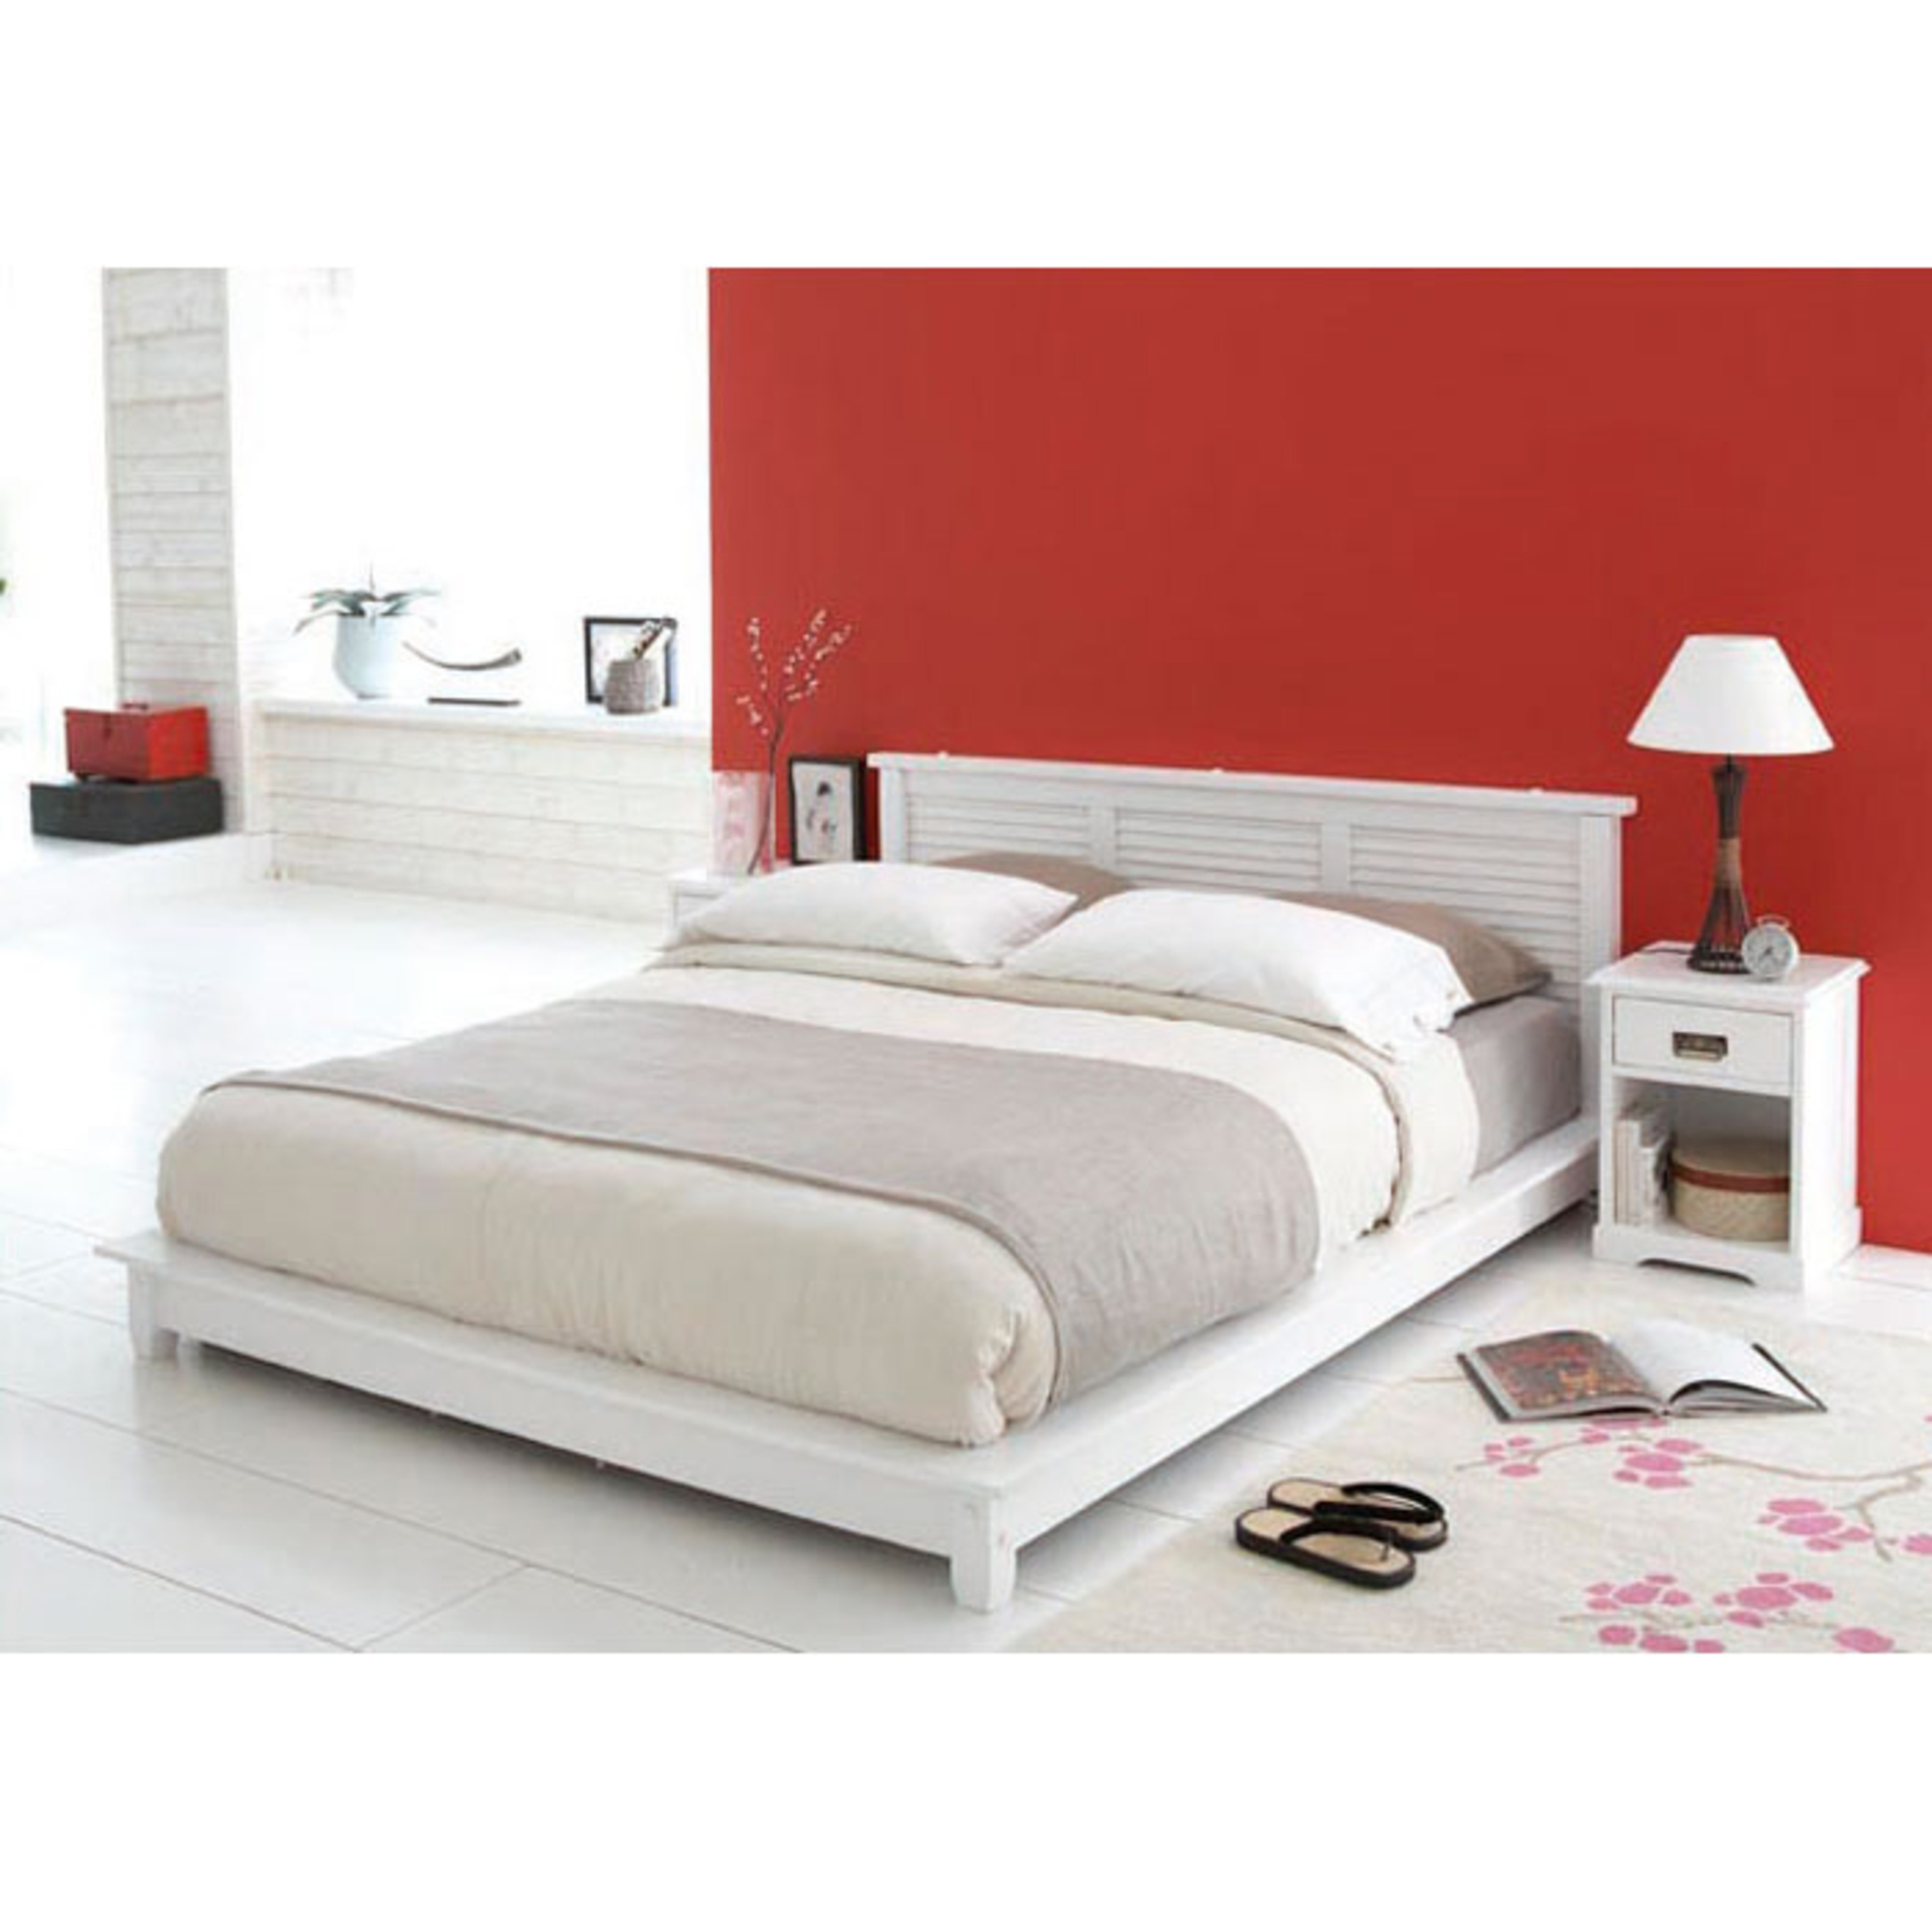 lit 160 x 200 cm plateforme maloom blanc anniversaire. Black Bedroom Furniture Sets. Home Design Ideas